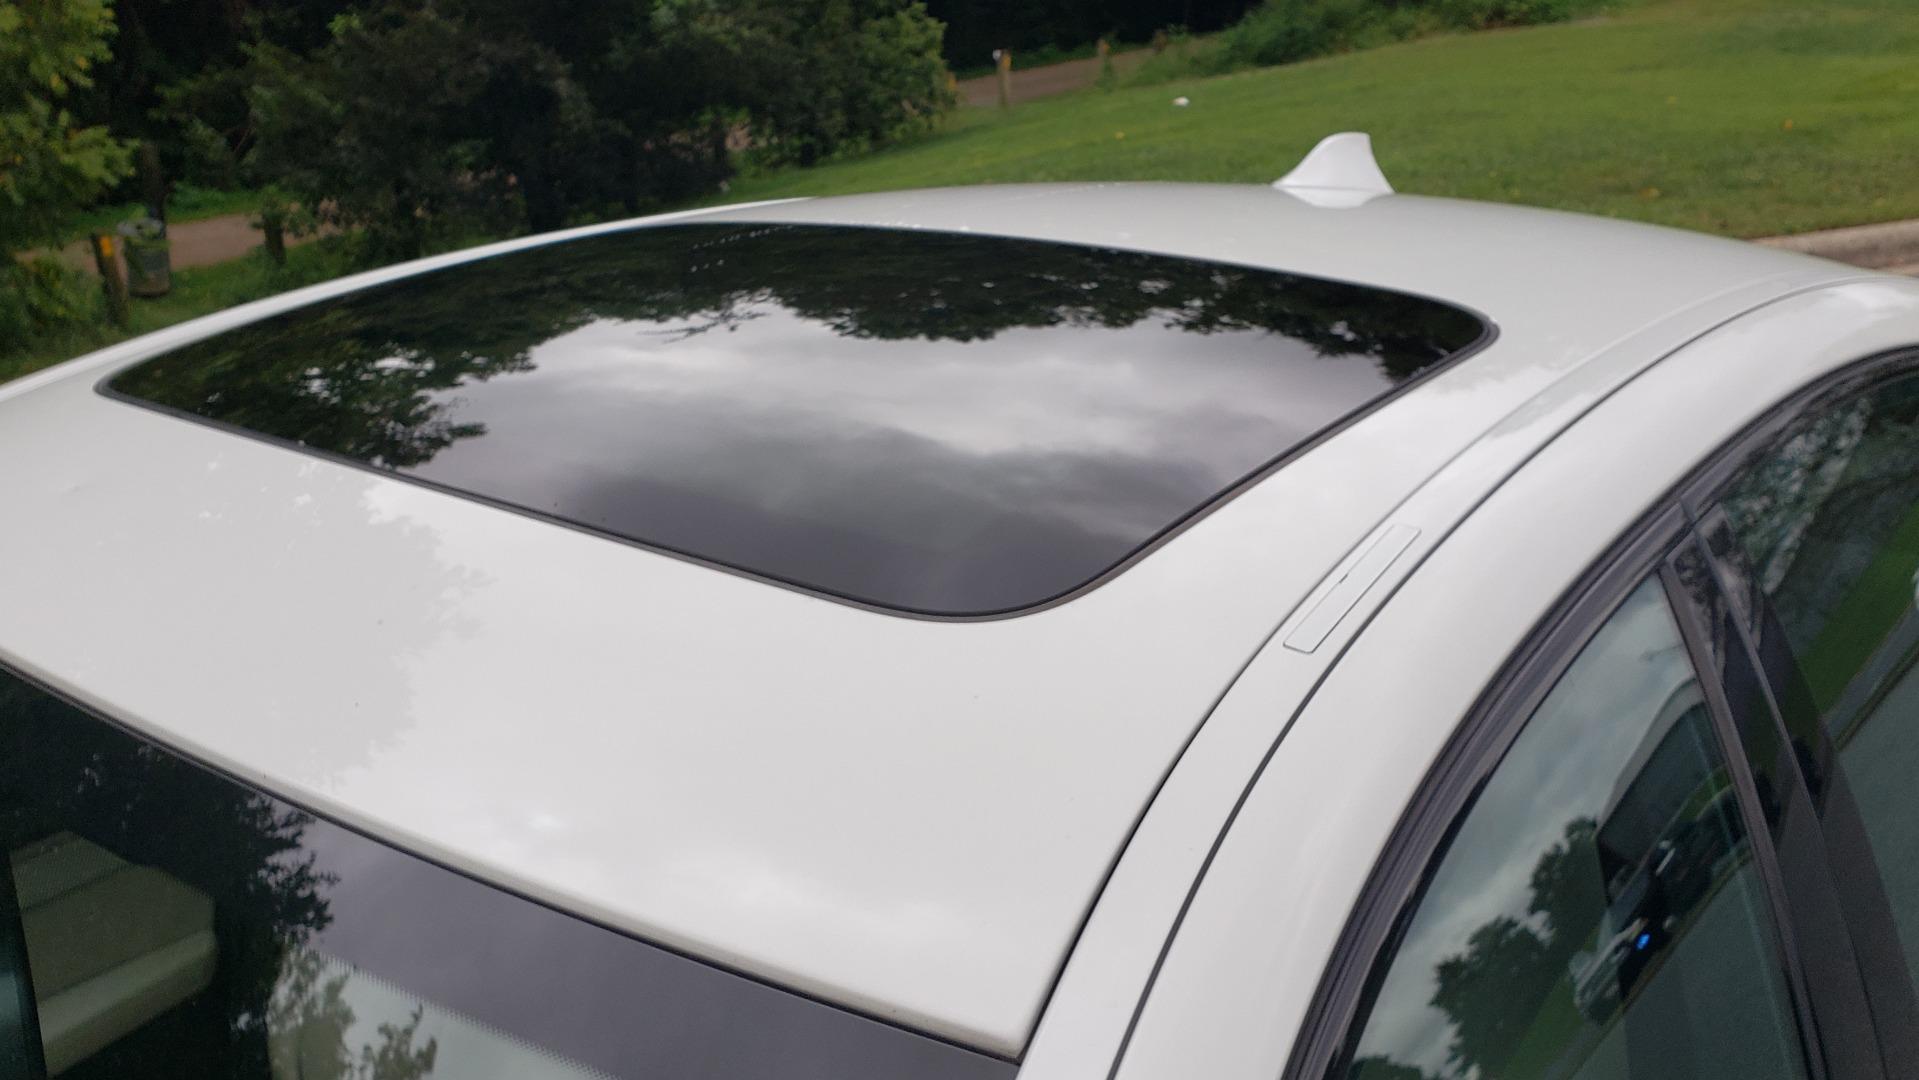 Used 2012 BMW 5 SERIES 550I M SPORT / NAV / CONV PKG / SUNROOF / PREM SND / REARVIEW for sale Sold at Formula Imports in Charlotte NC 28227 11